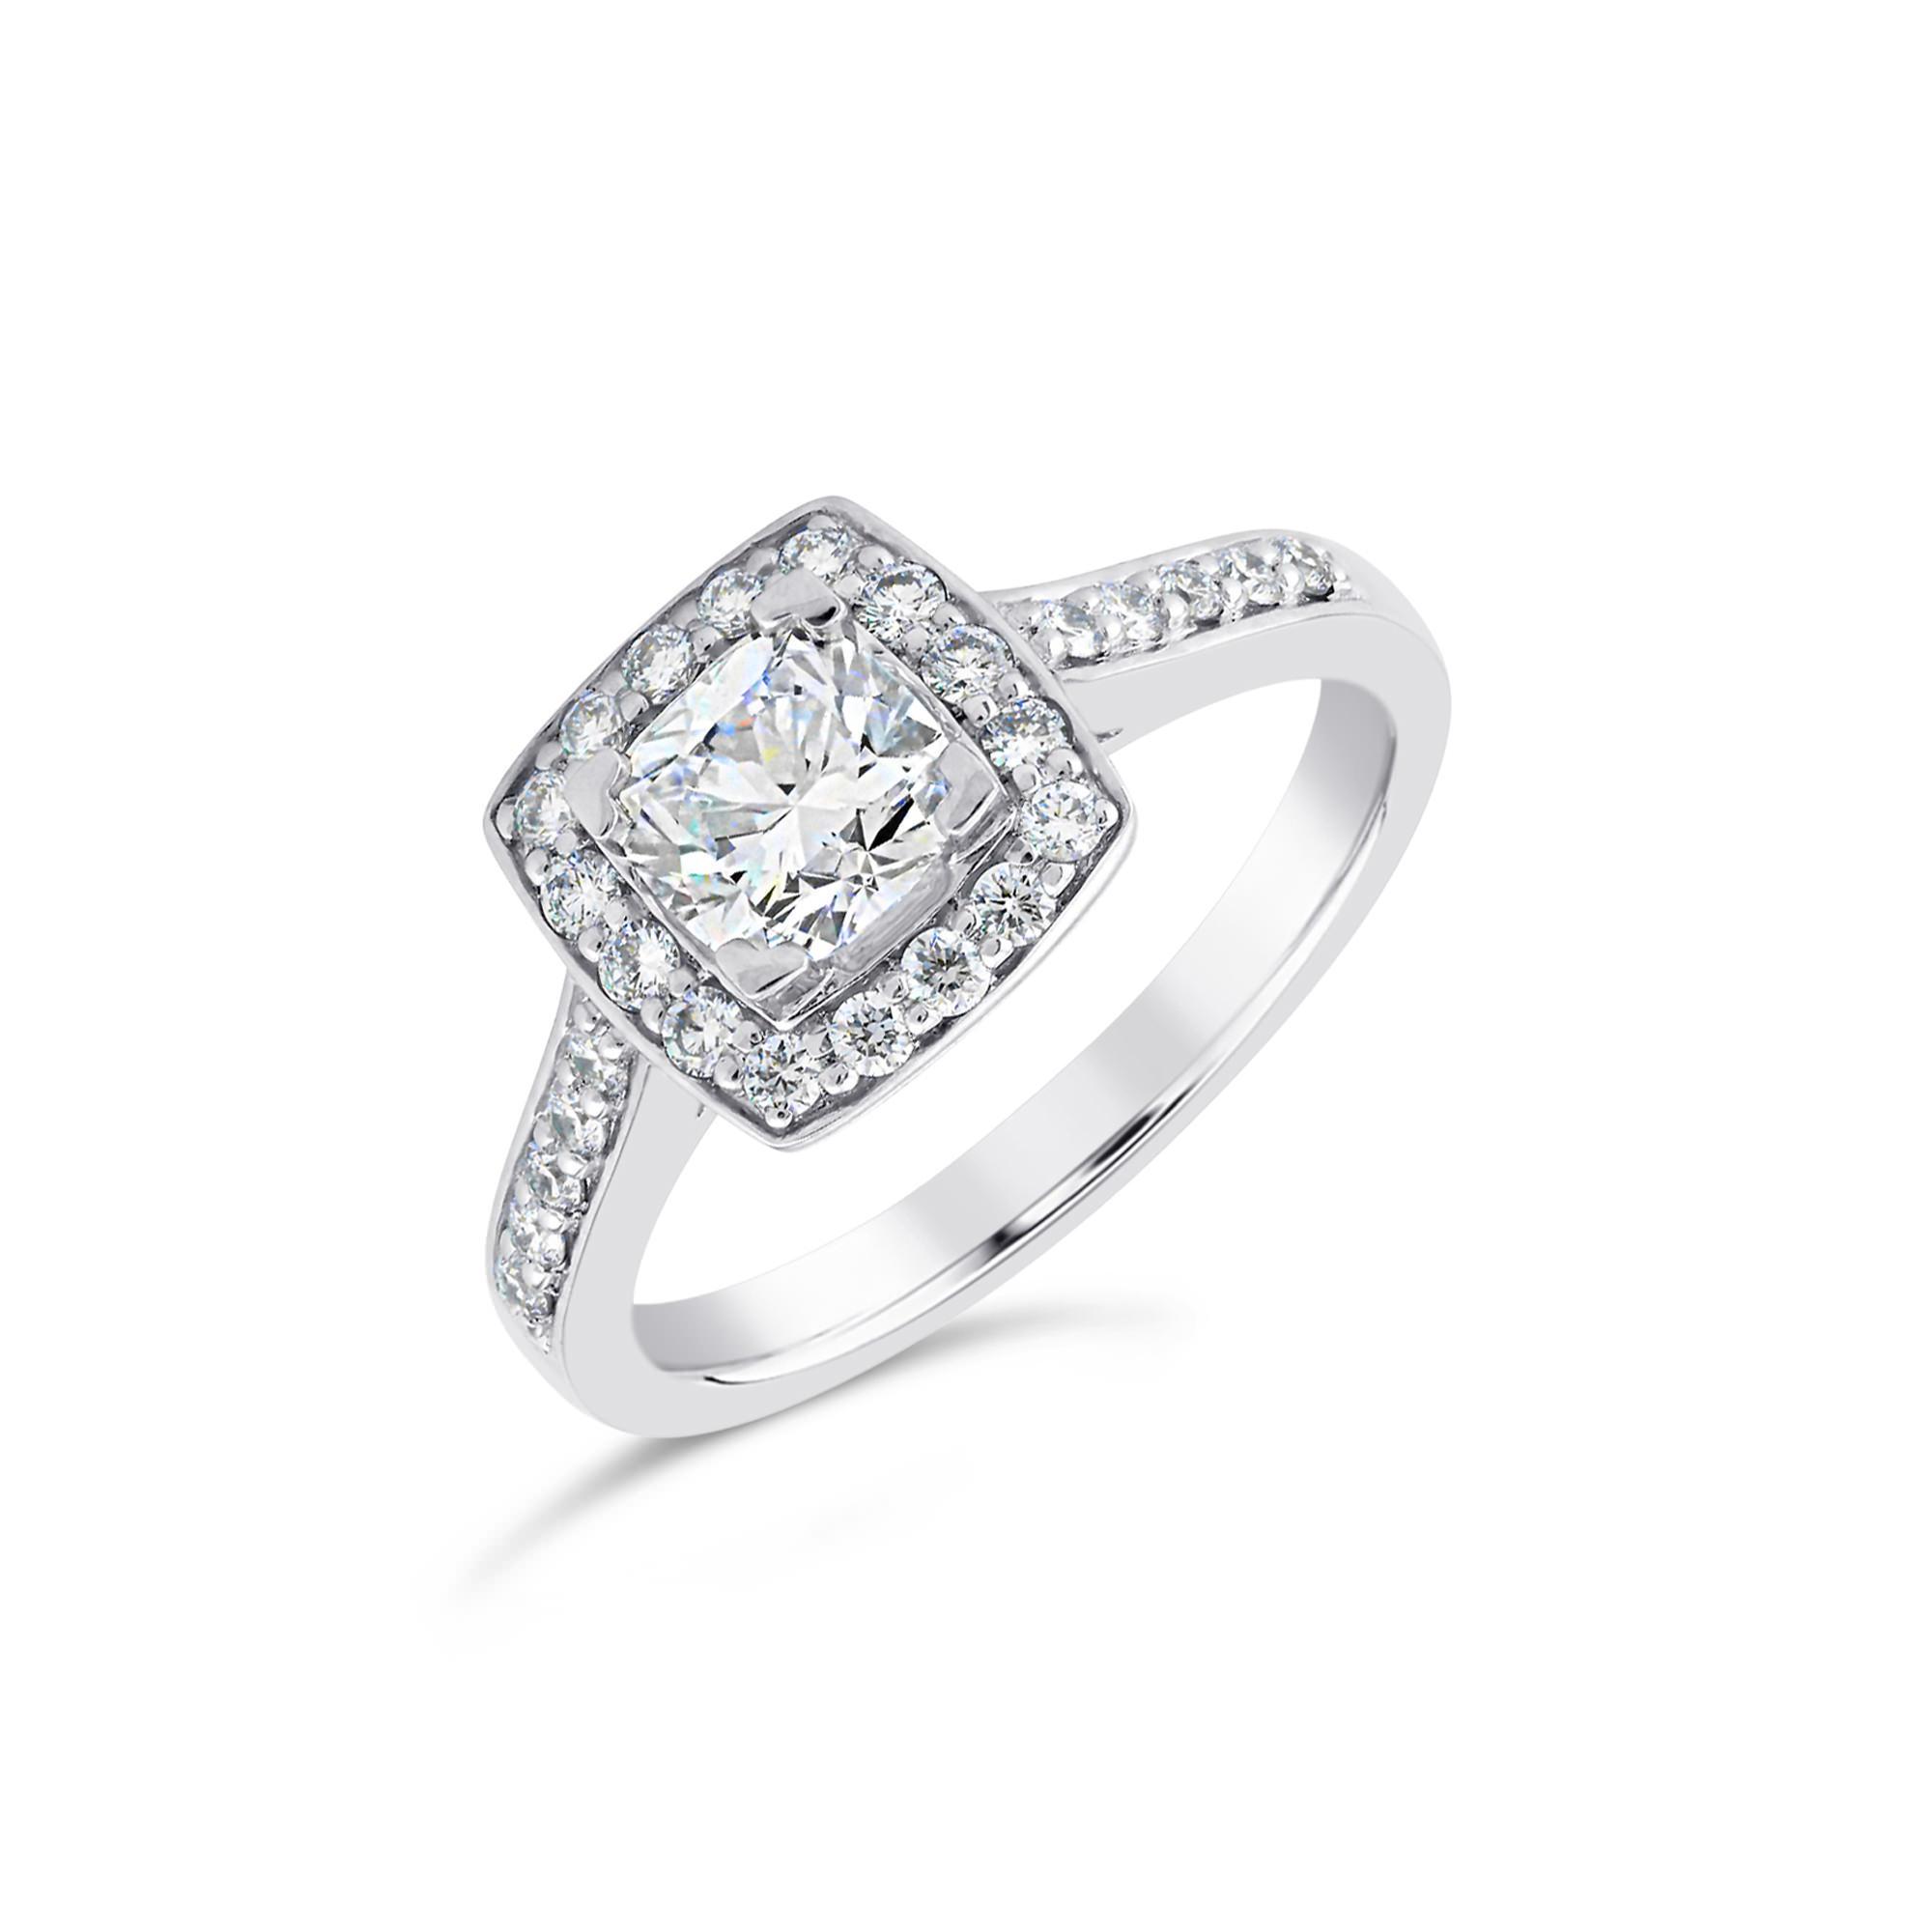 Cushion Cut Platinum Diamond Halo Ring